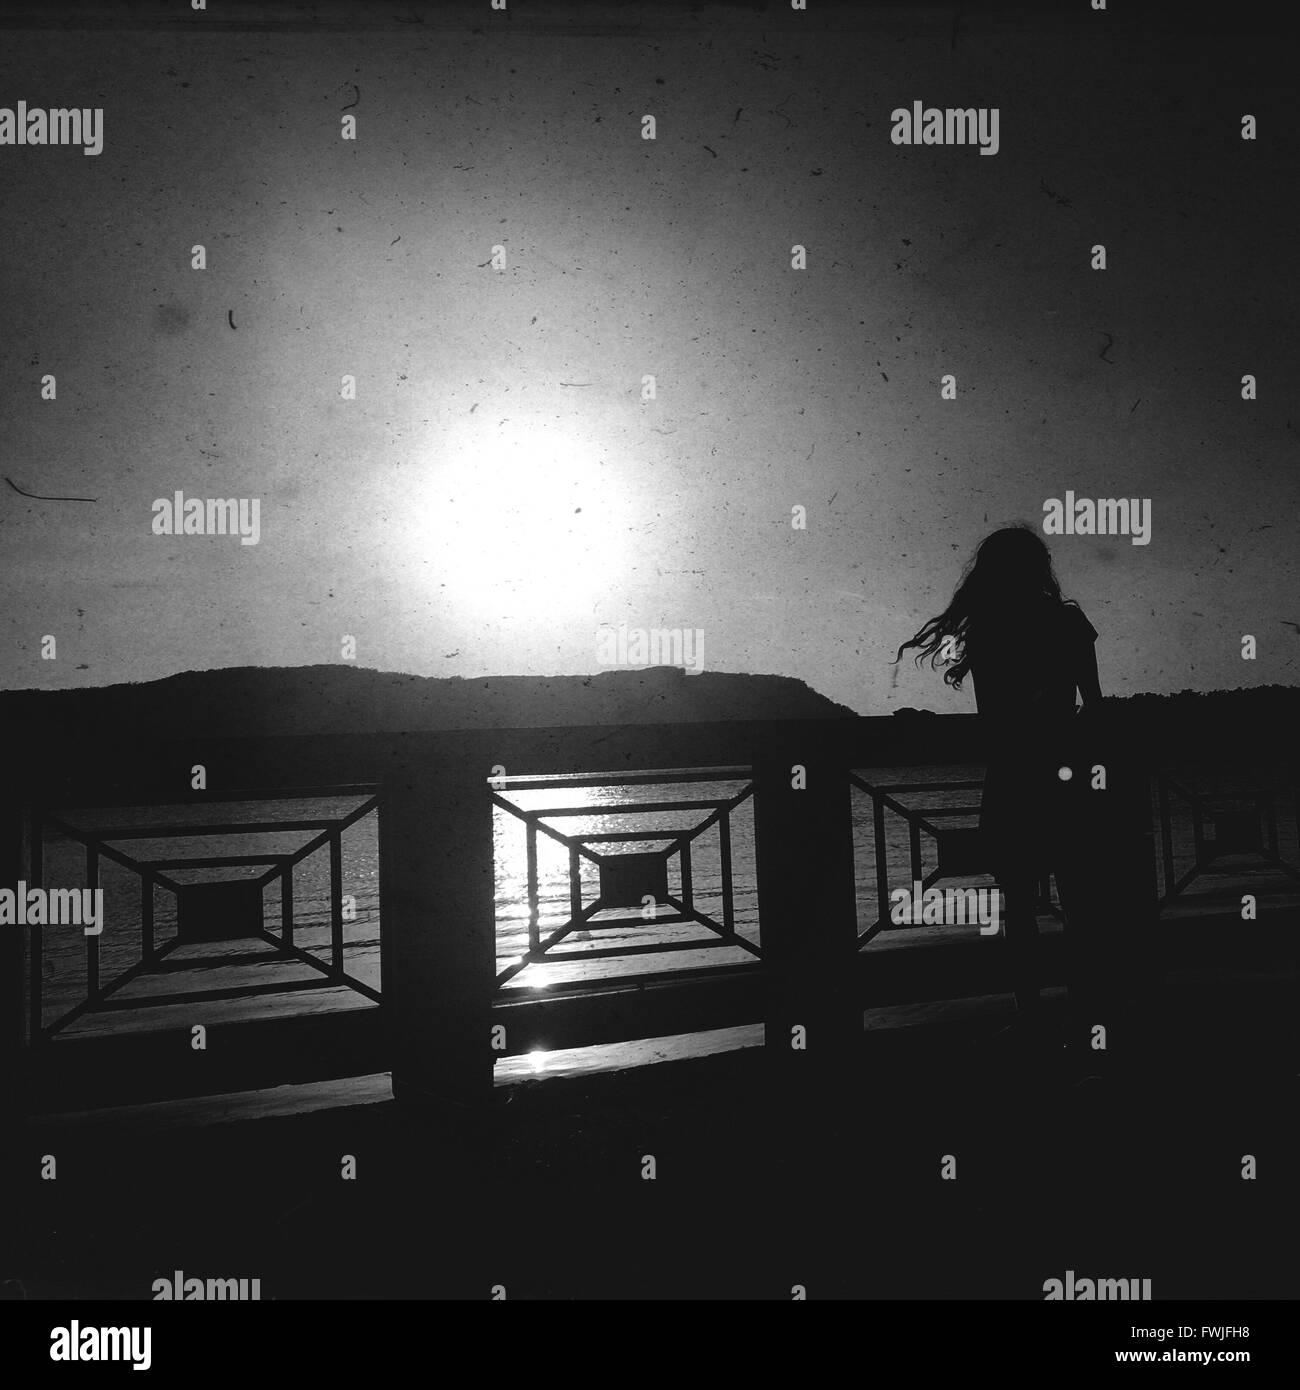 Silhouette auf Fußgängerbrücke über Fluss gegen hellen Himmel stehend Stockbild